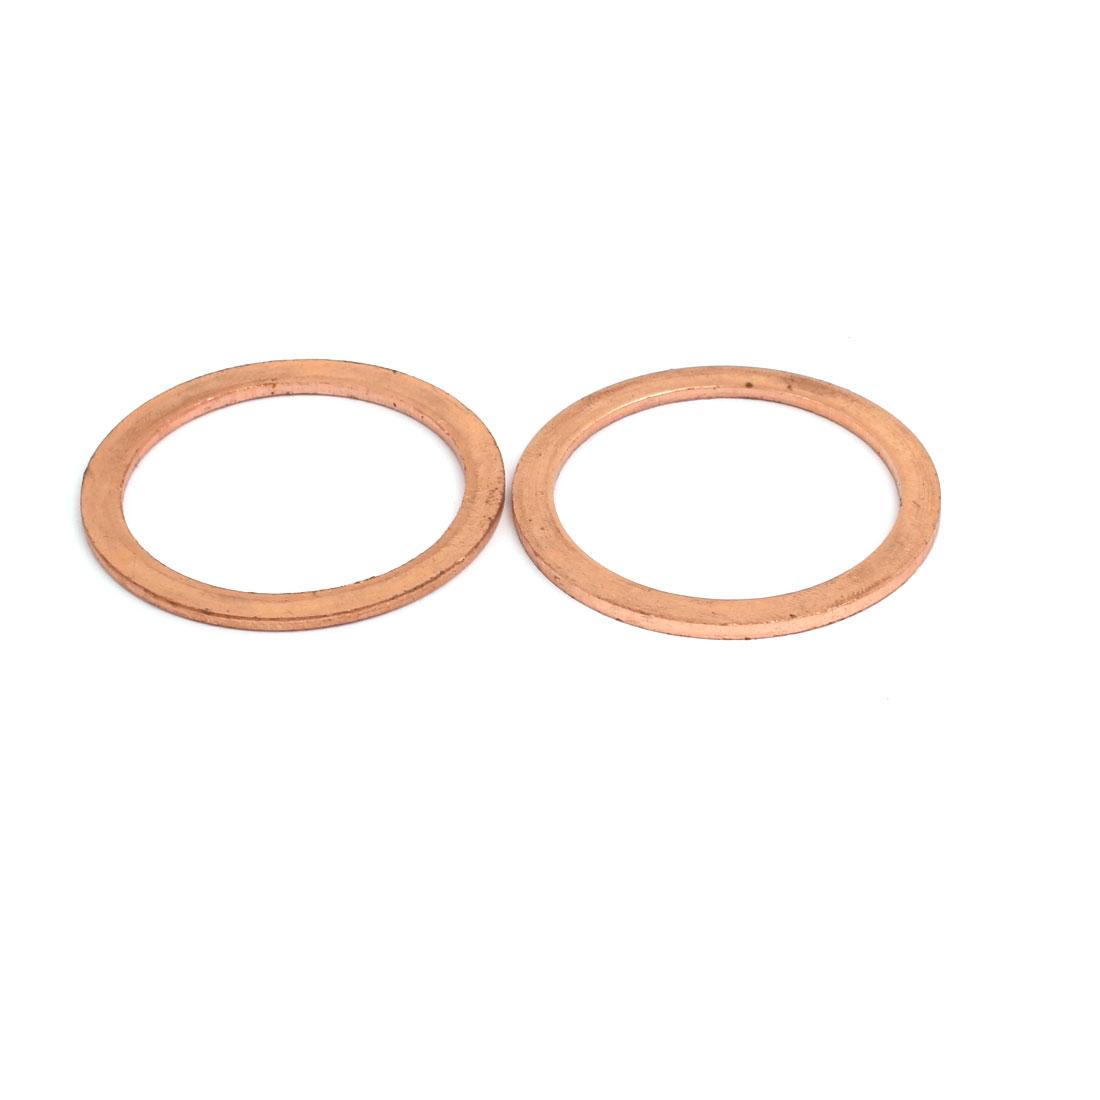 2pcs 38mmx48mmx2mm Copper Flat Ring Sealing Crush Washer Gasket Grommet